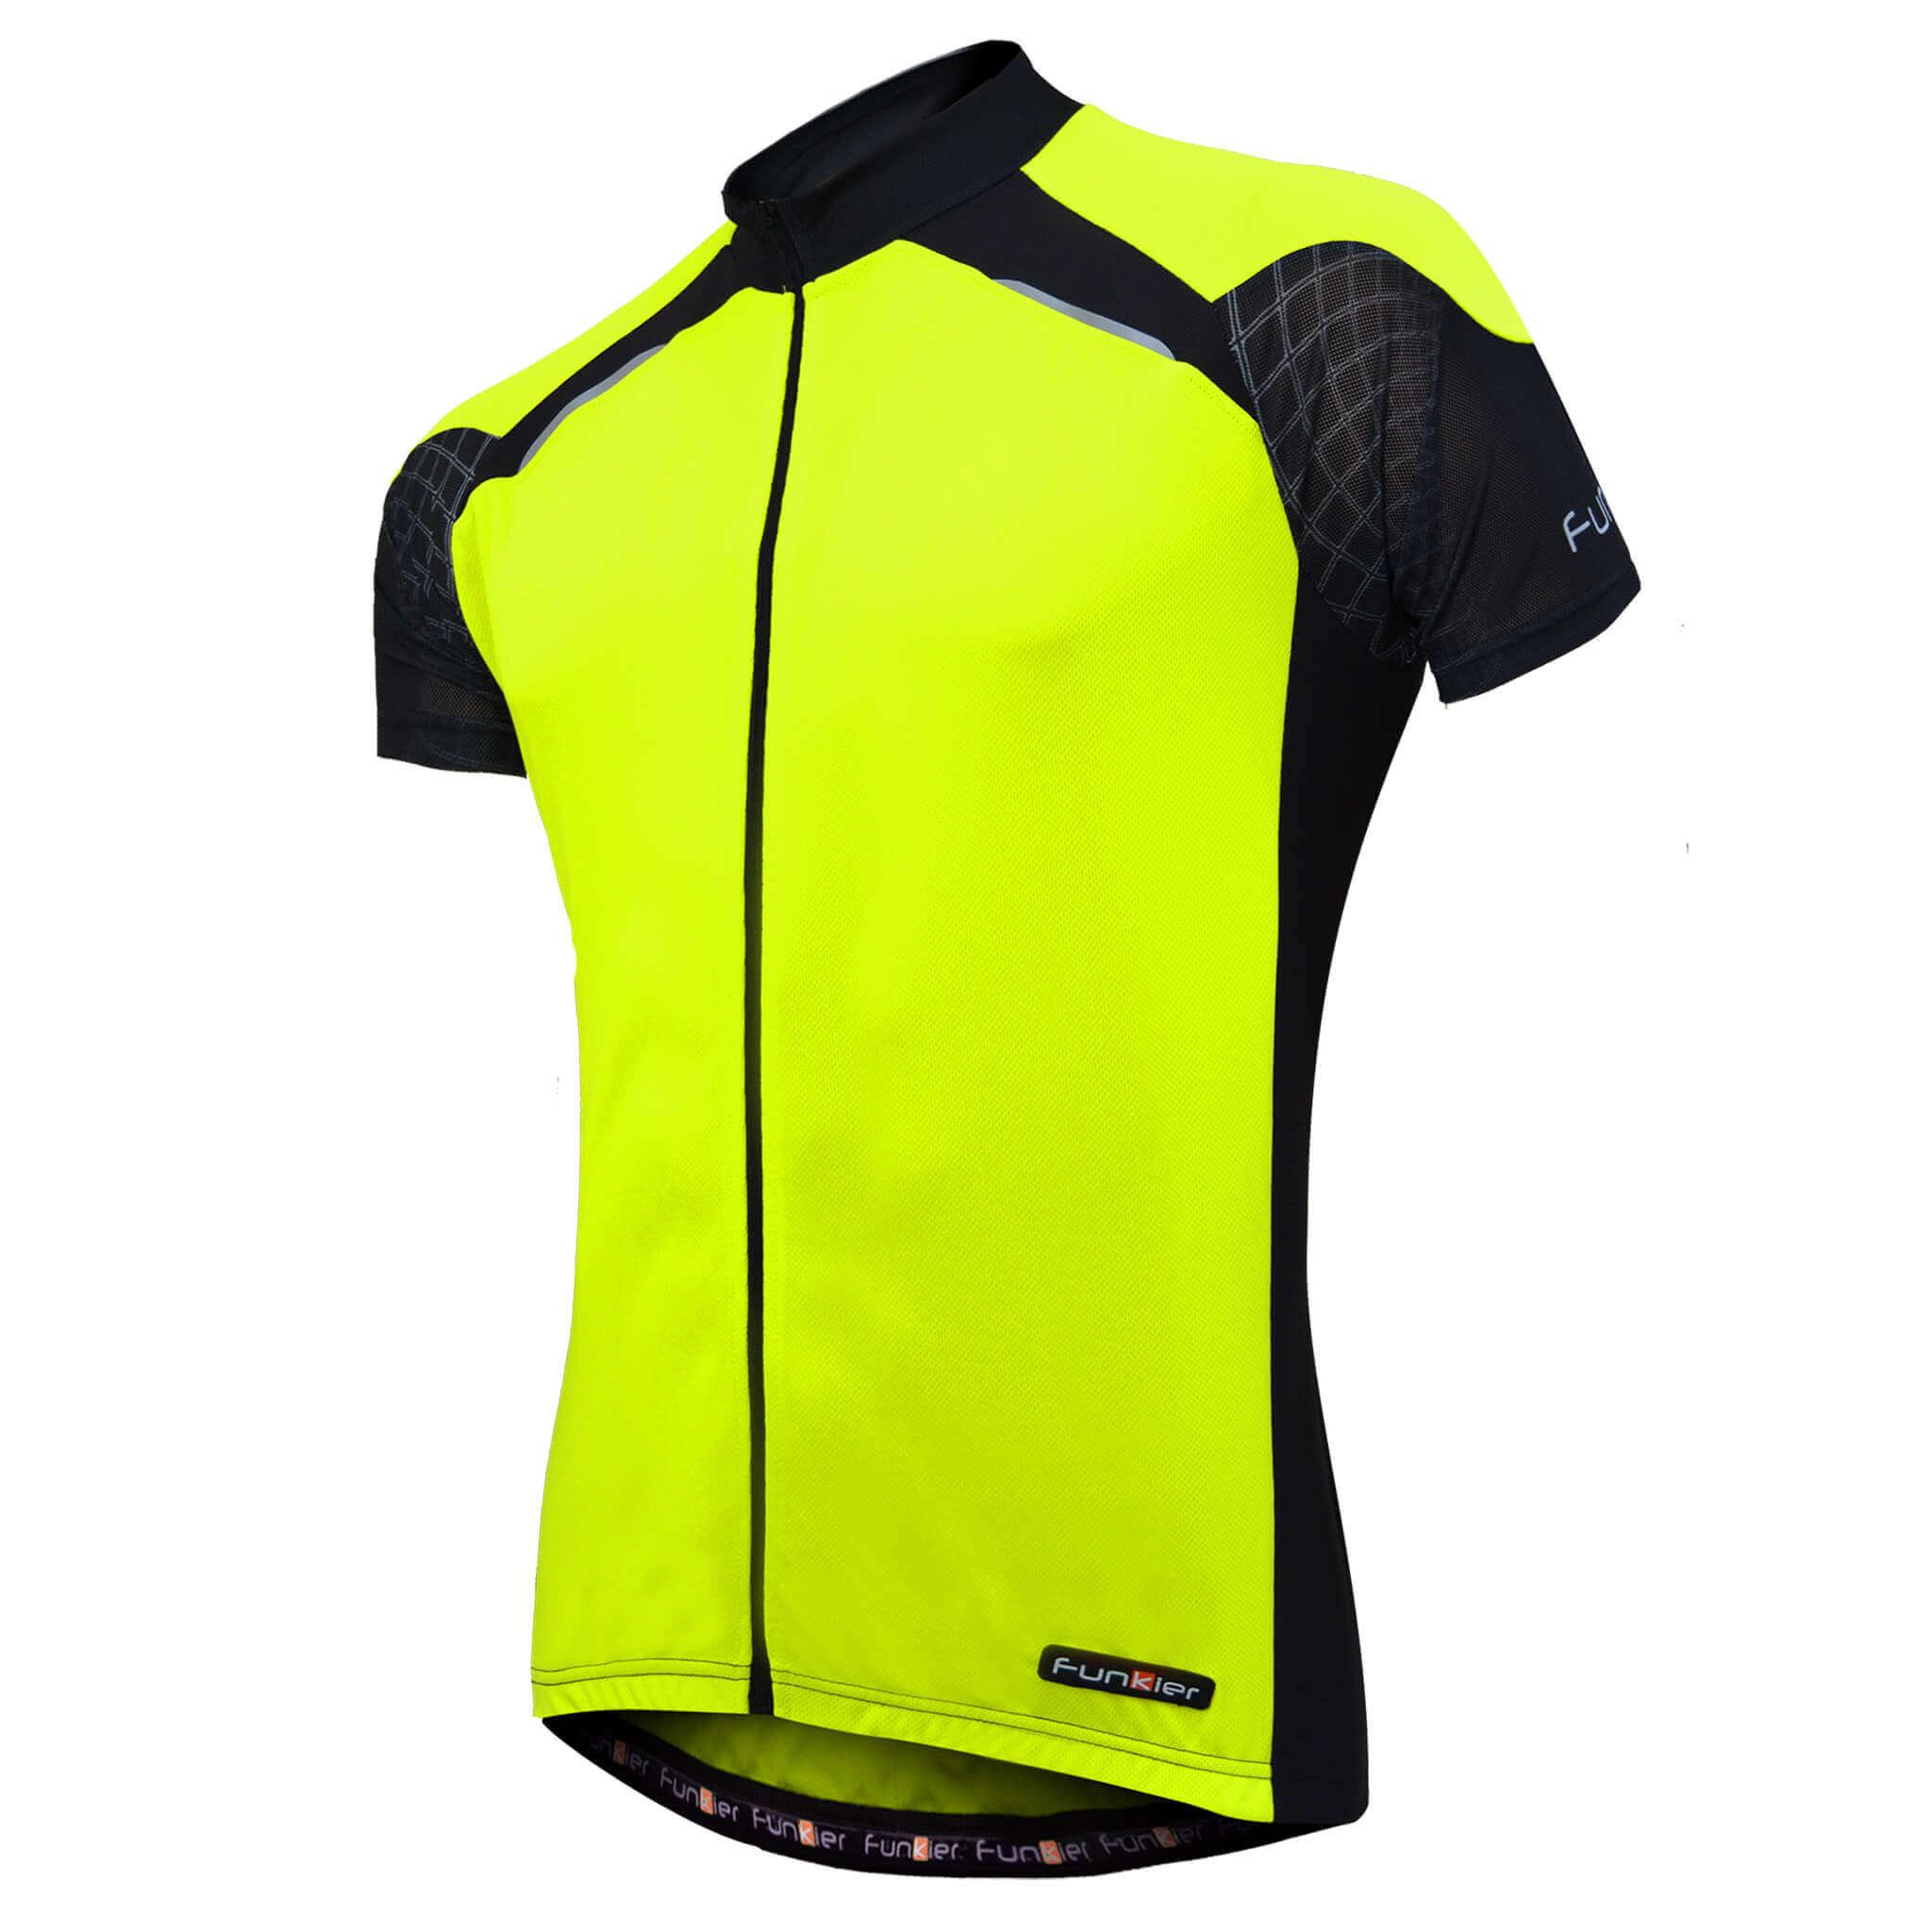 Funkier Women's Cycling Short Sleeve Jersey Full Zipper WJ-730-1 Summer Fabric